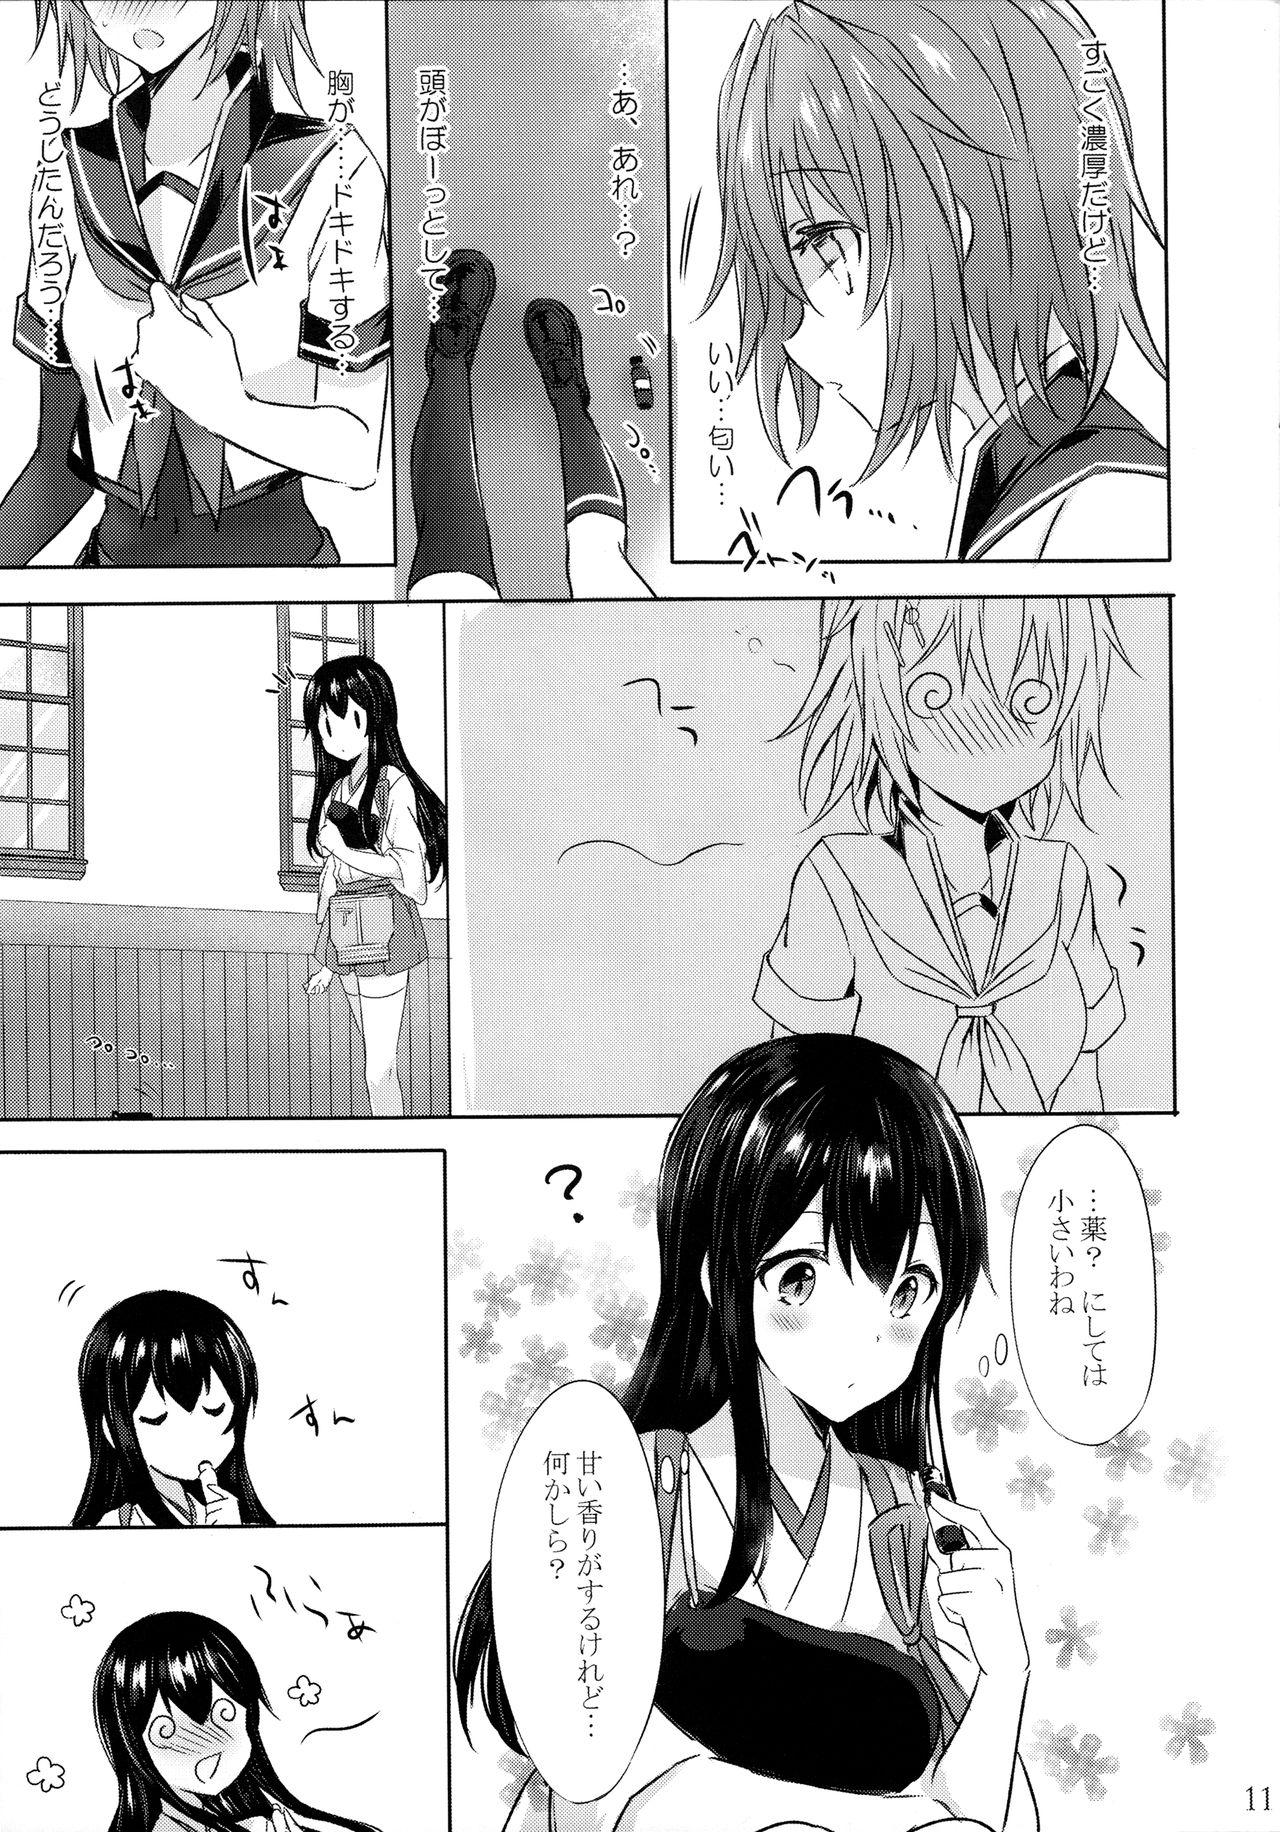 Toaru Koibito-tachi no Futari Ecchi 10